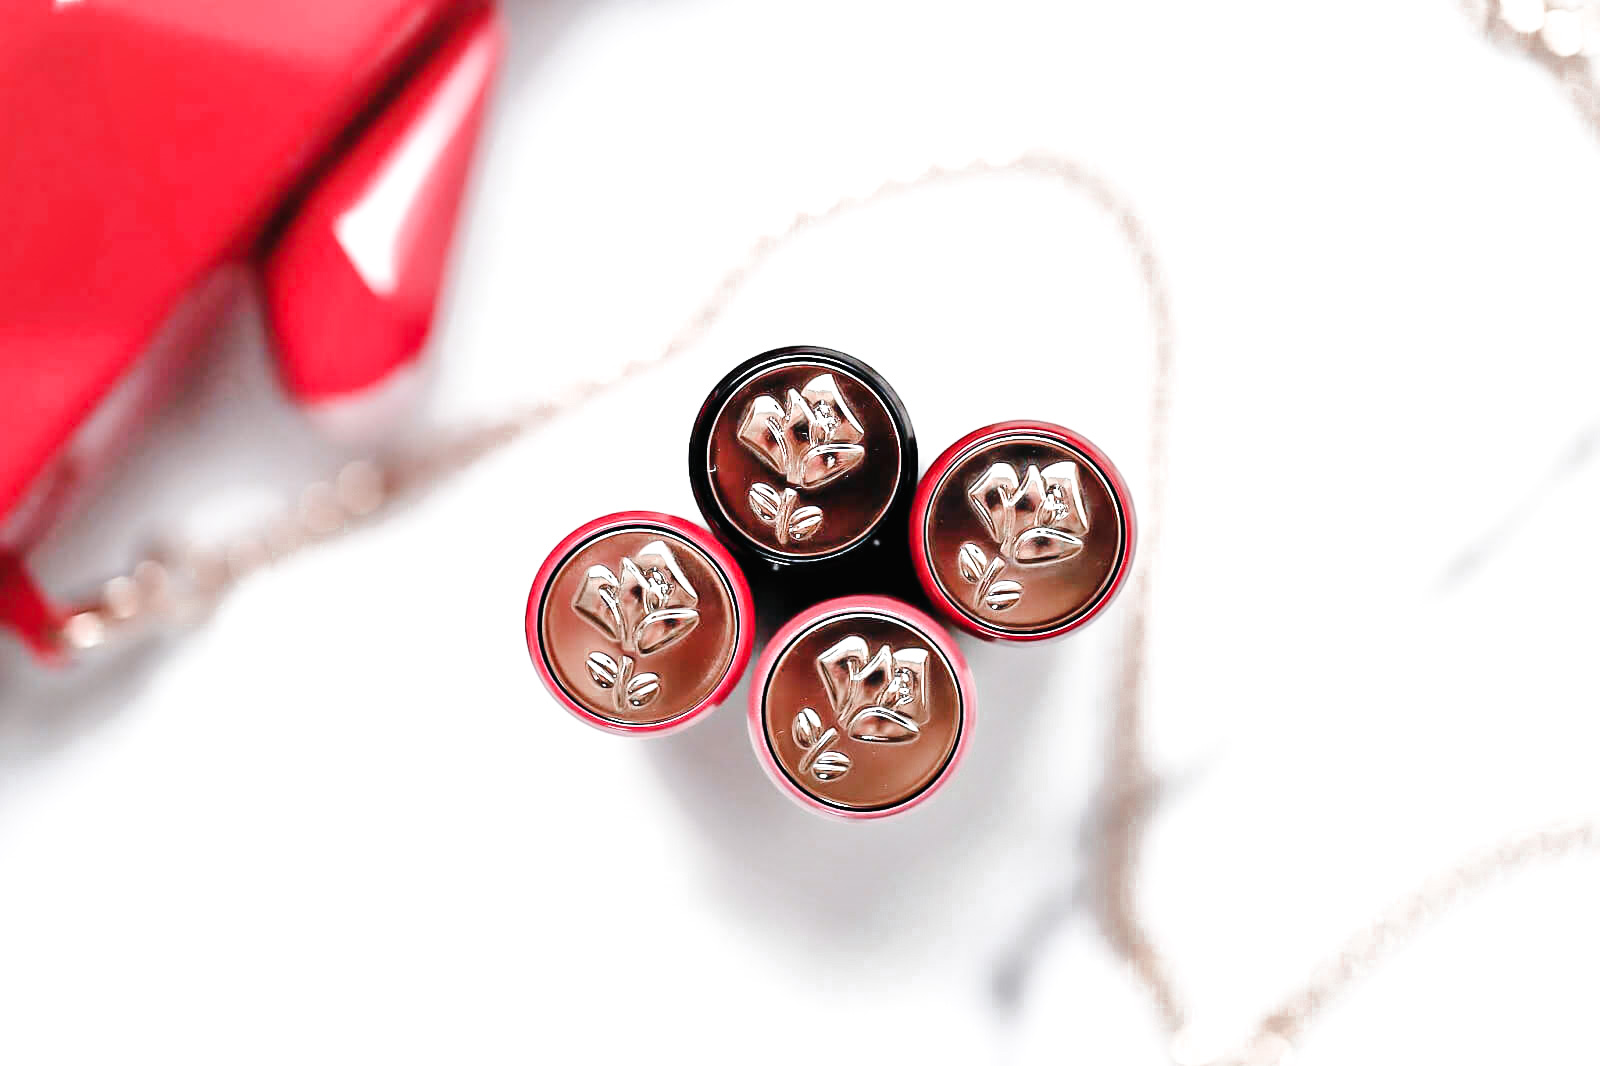 Lancôme L'Absolu Rouge Ruby Cream Avis